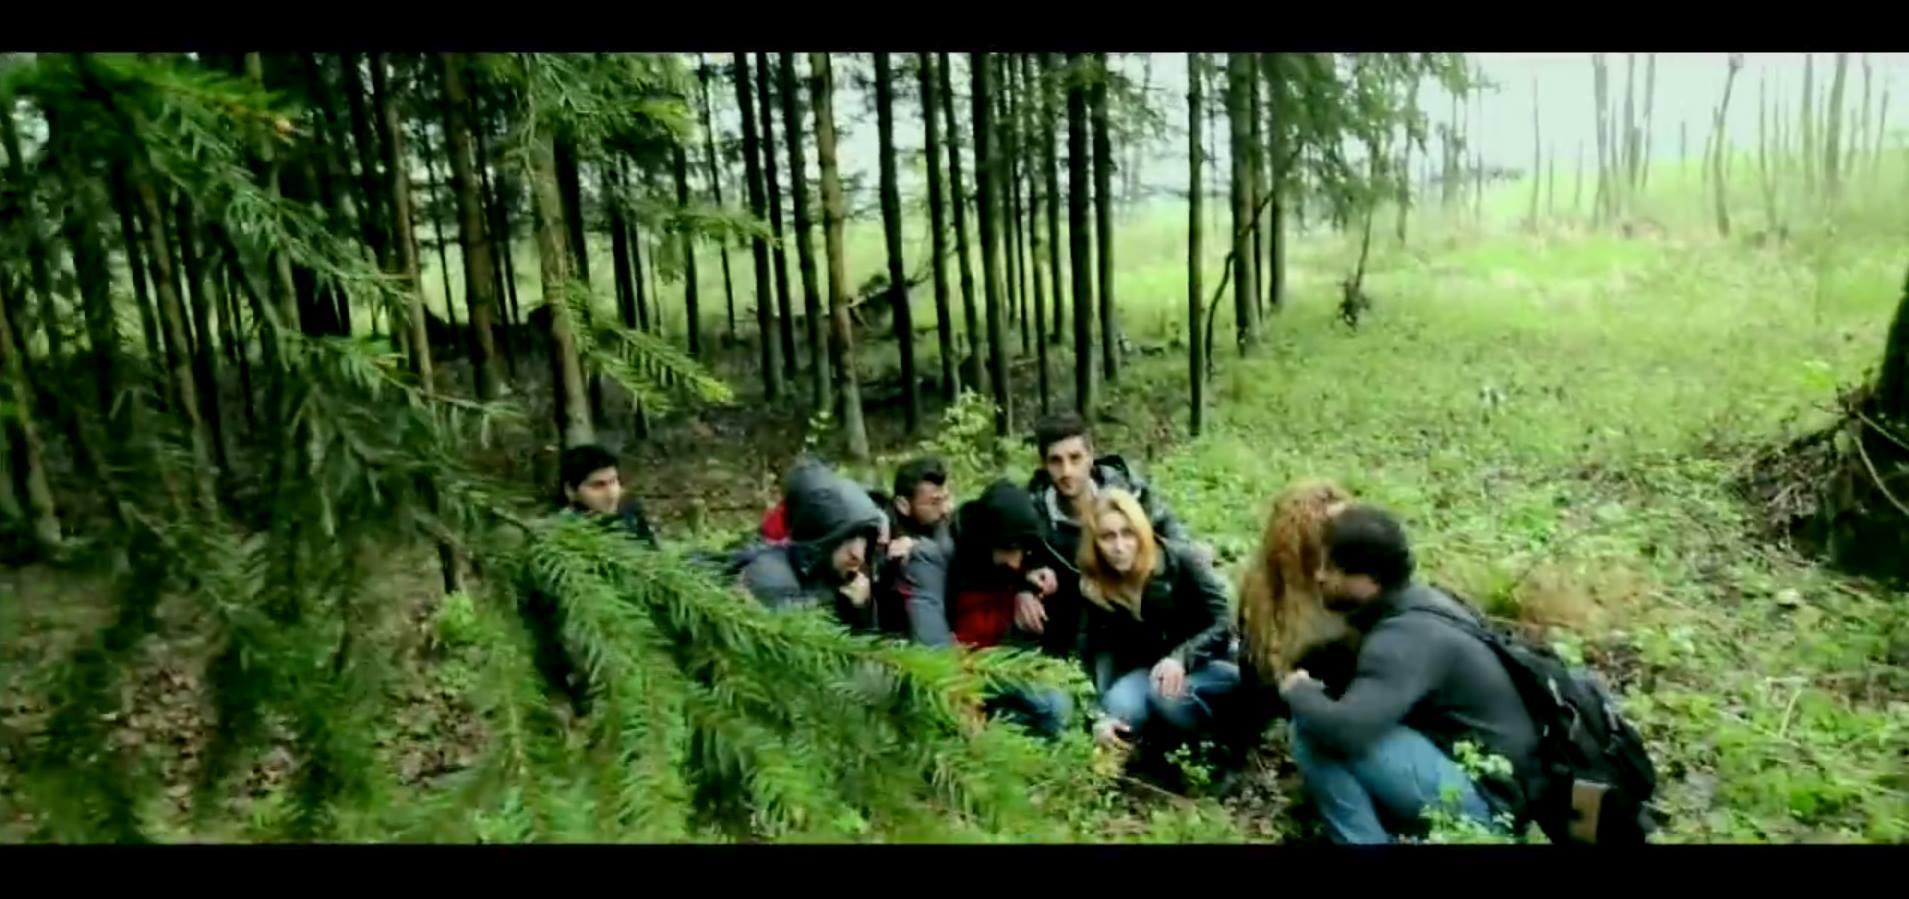 فلم نفرستان Neferistan Film 1